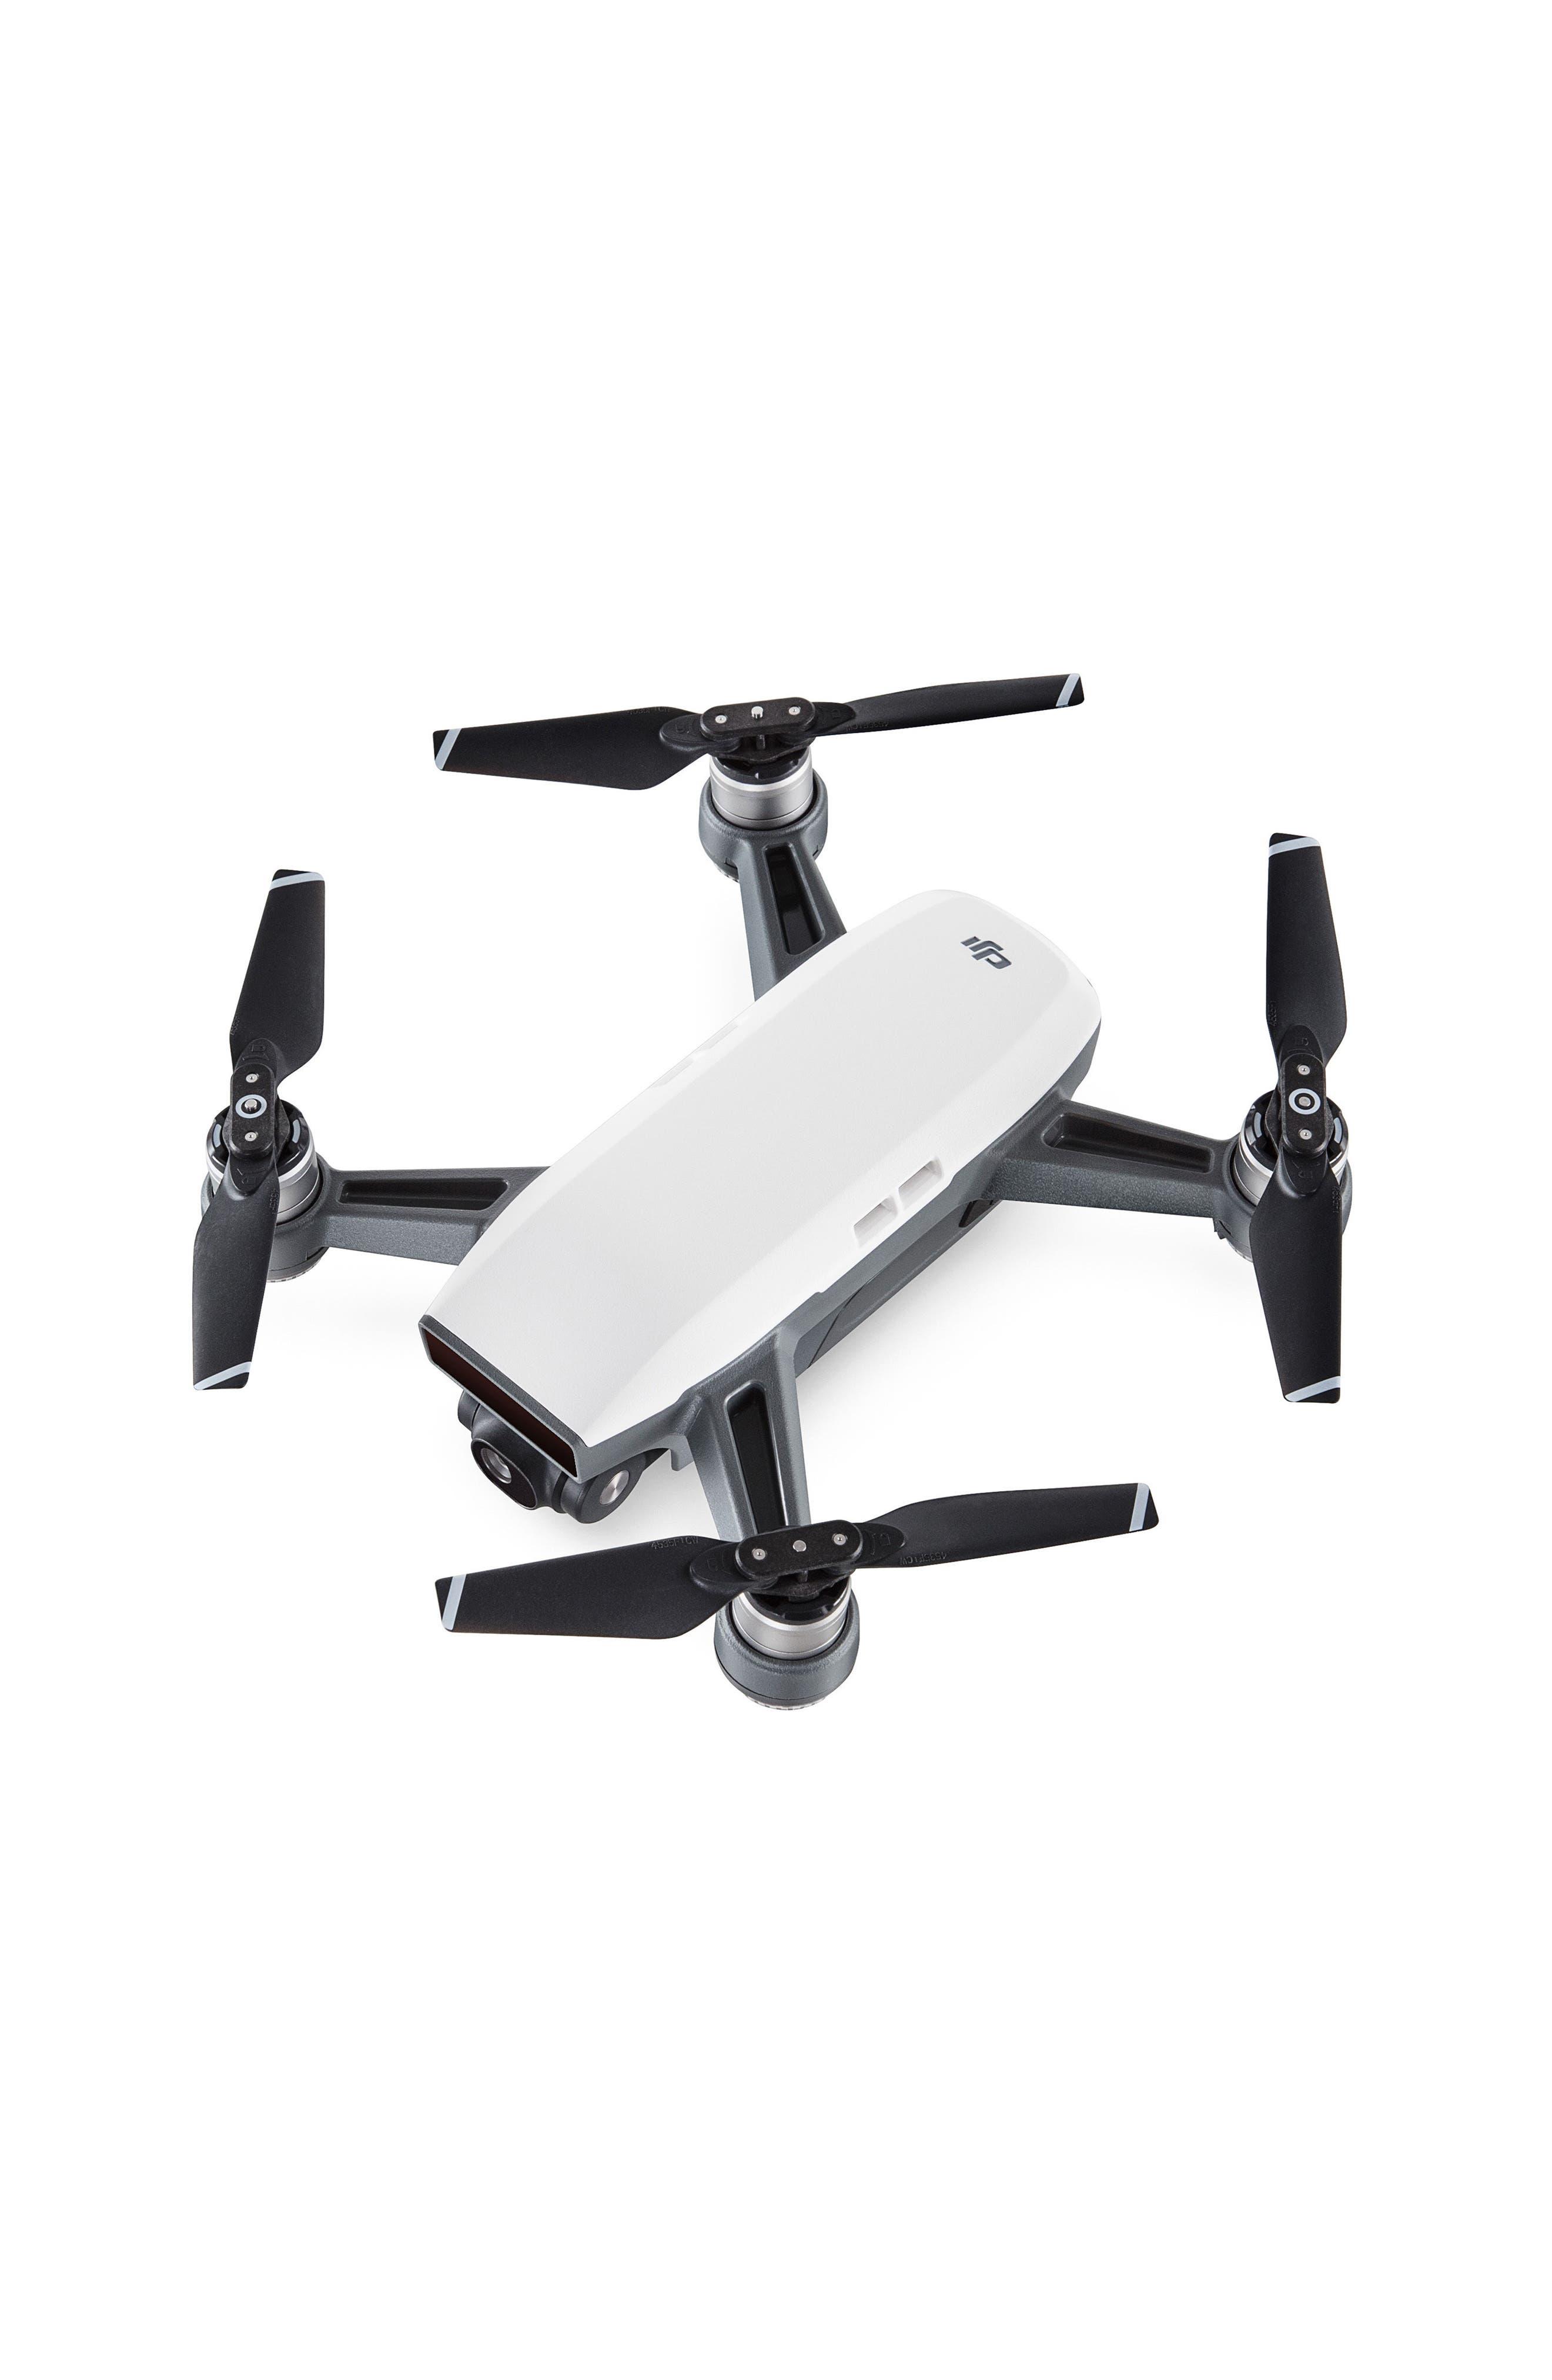 DJI Spark Mini Flying Quadcopter